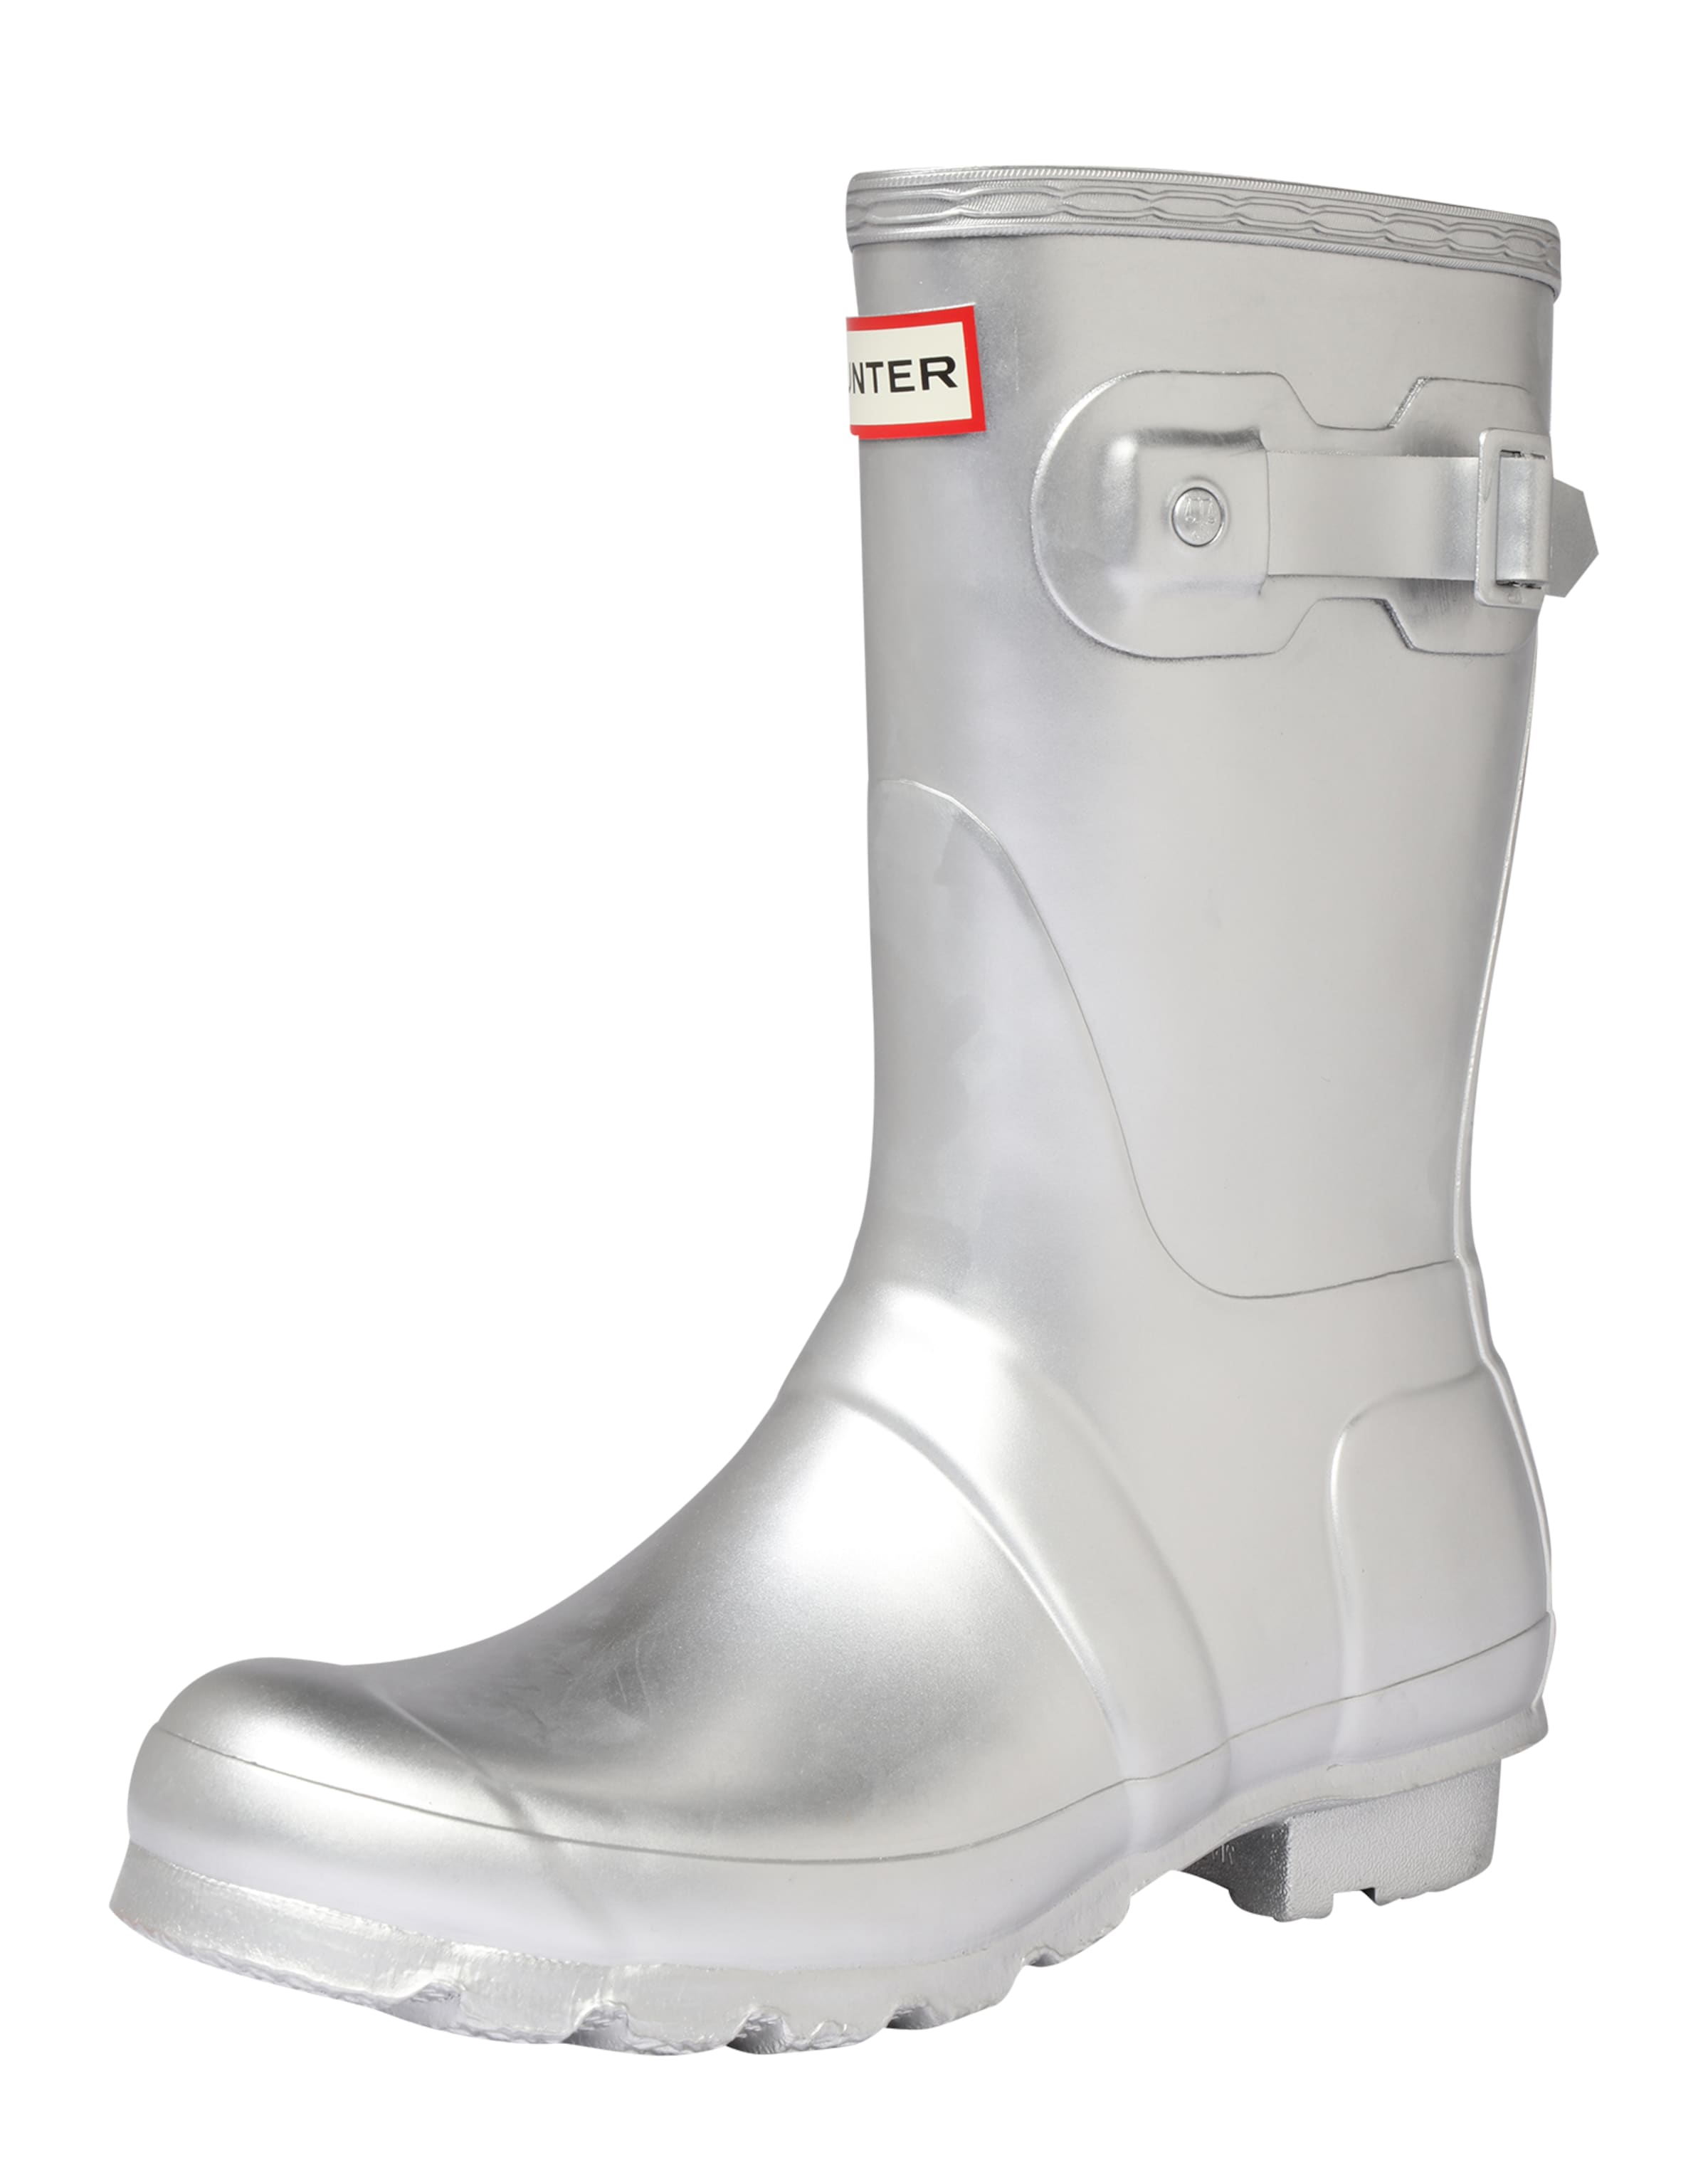 Haltbare Mode billige Schuhe HUNTER getragene   Gummistiefel Schuhe Gut getragene HUNTER Schuhe a5cb74